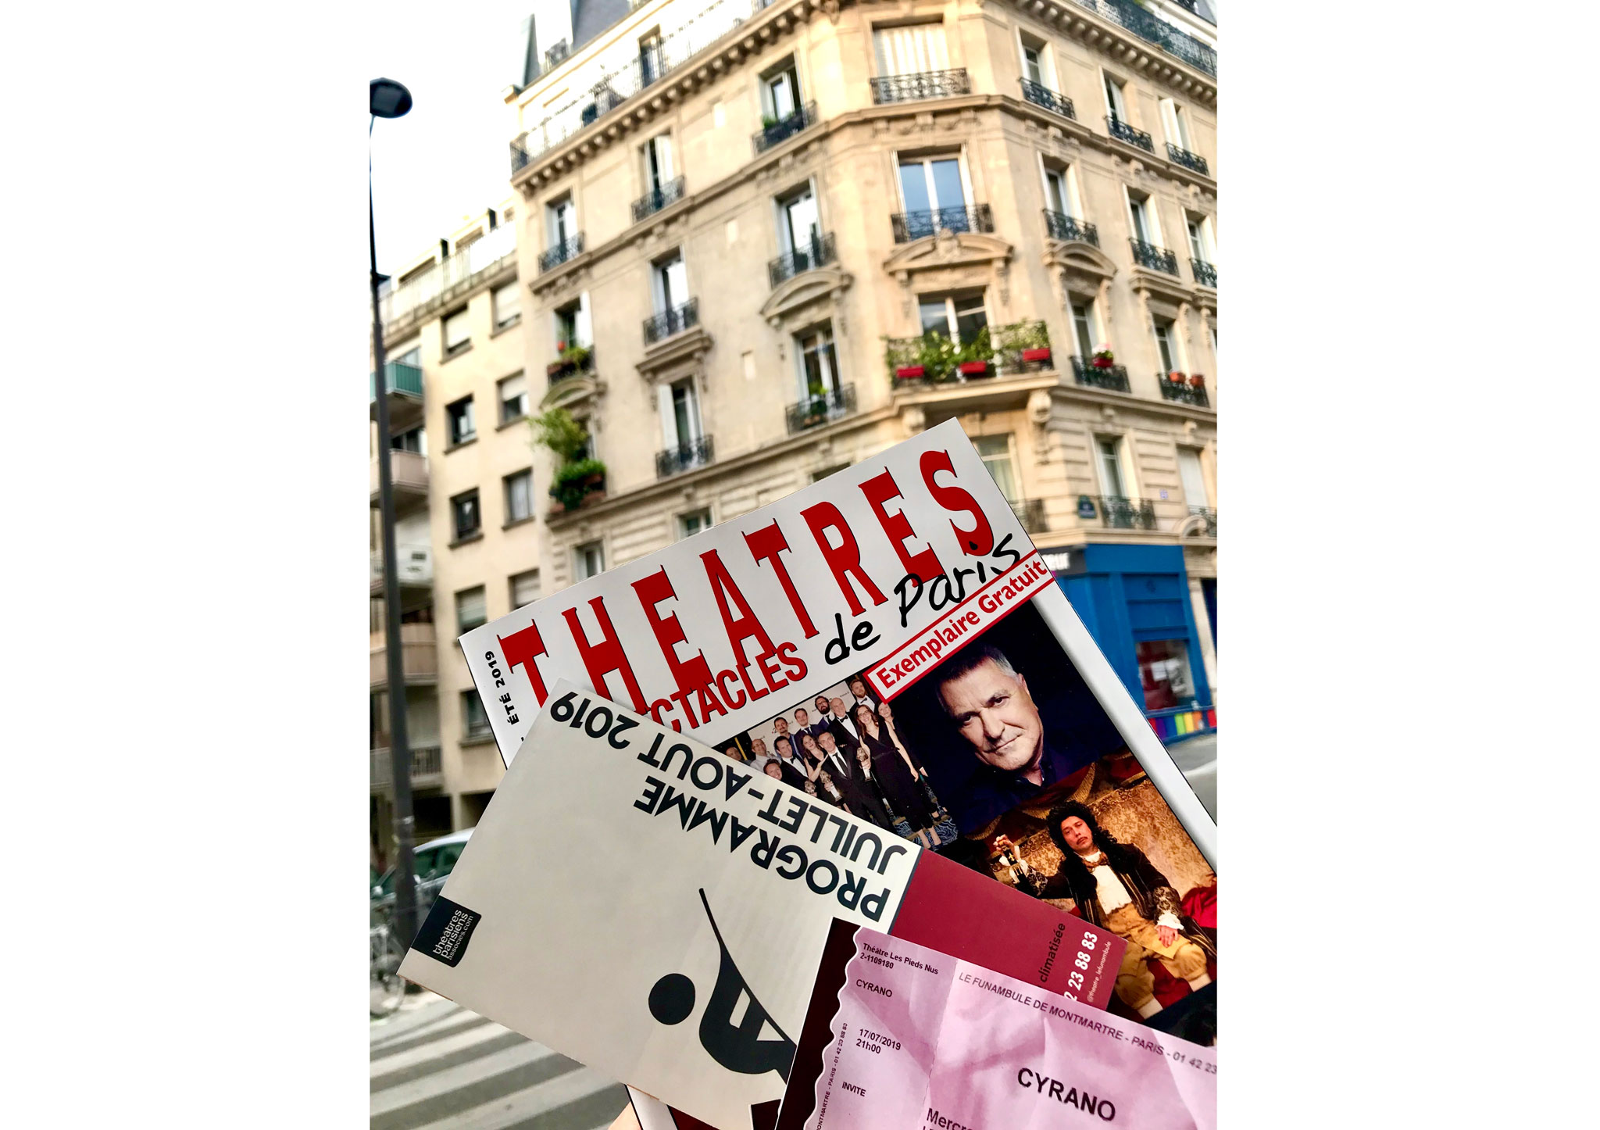 Билеты на спектакль «Сирано де Бержерак» («Cyrano»).  Театр на Монмартре Le Funambule.  Первая аккредитация.